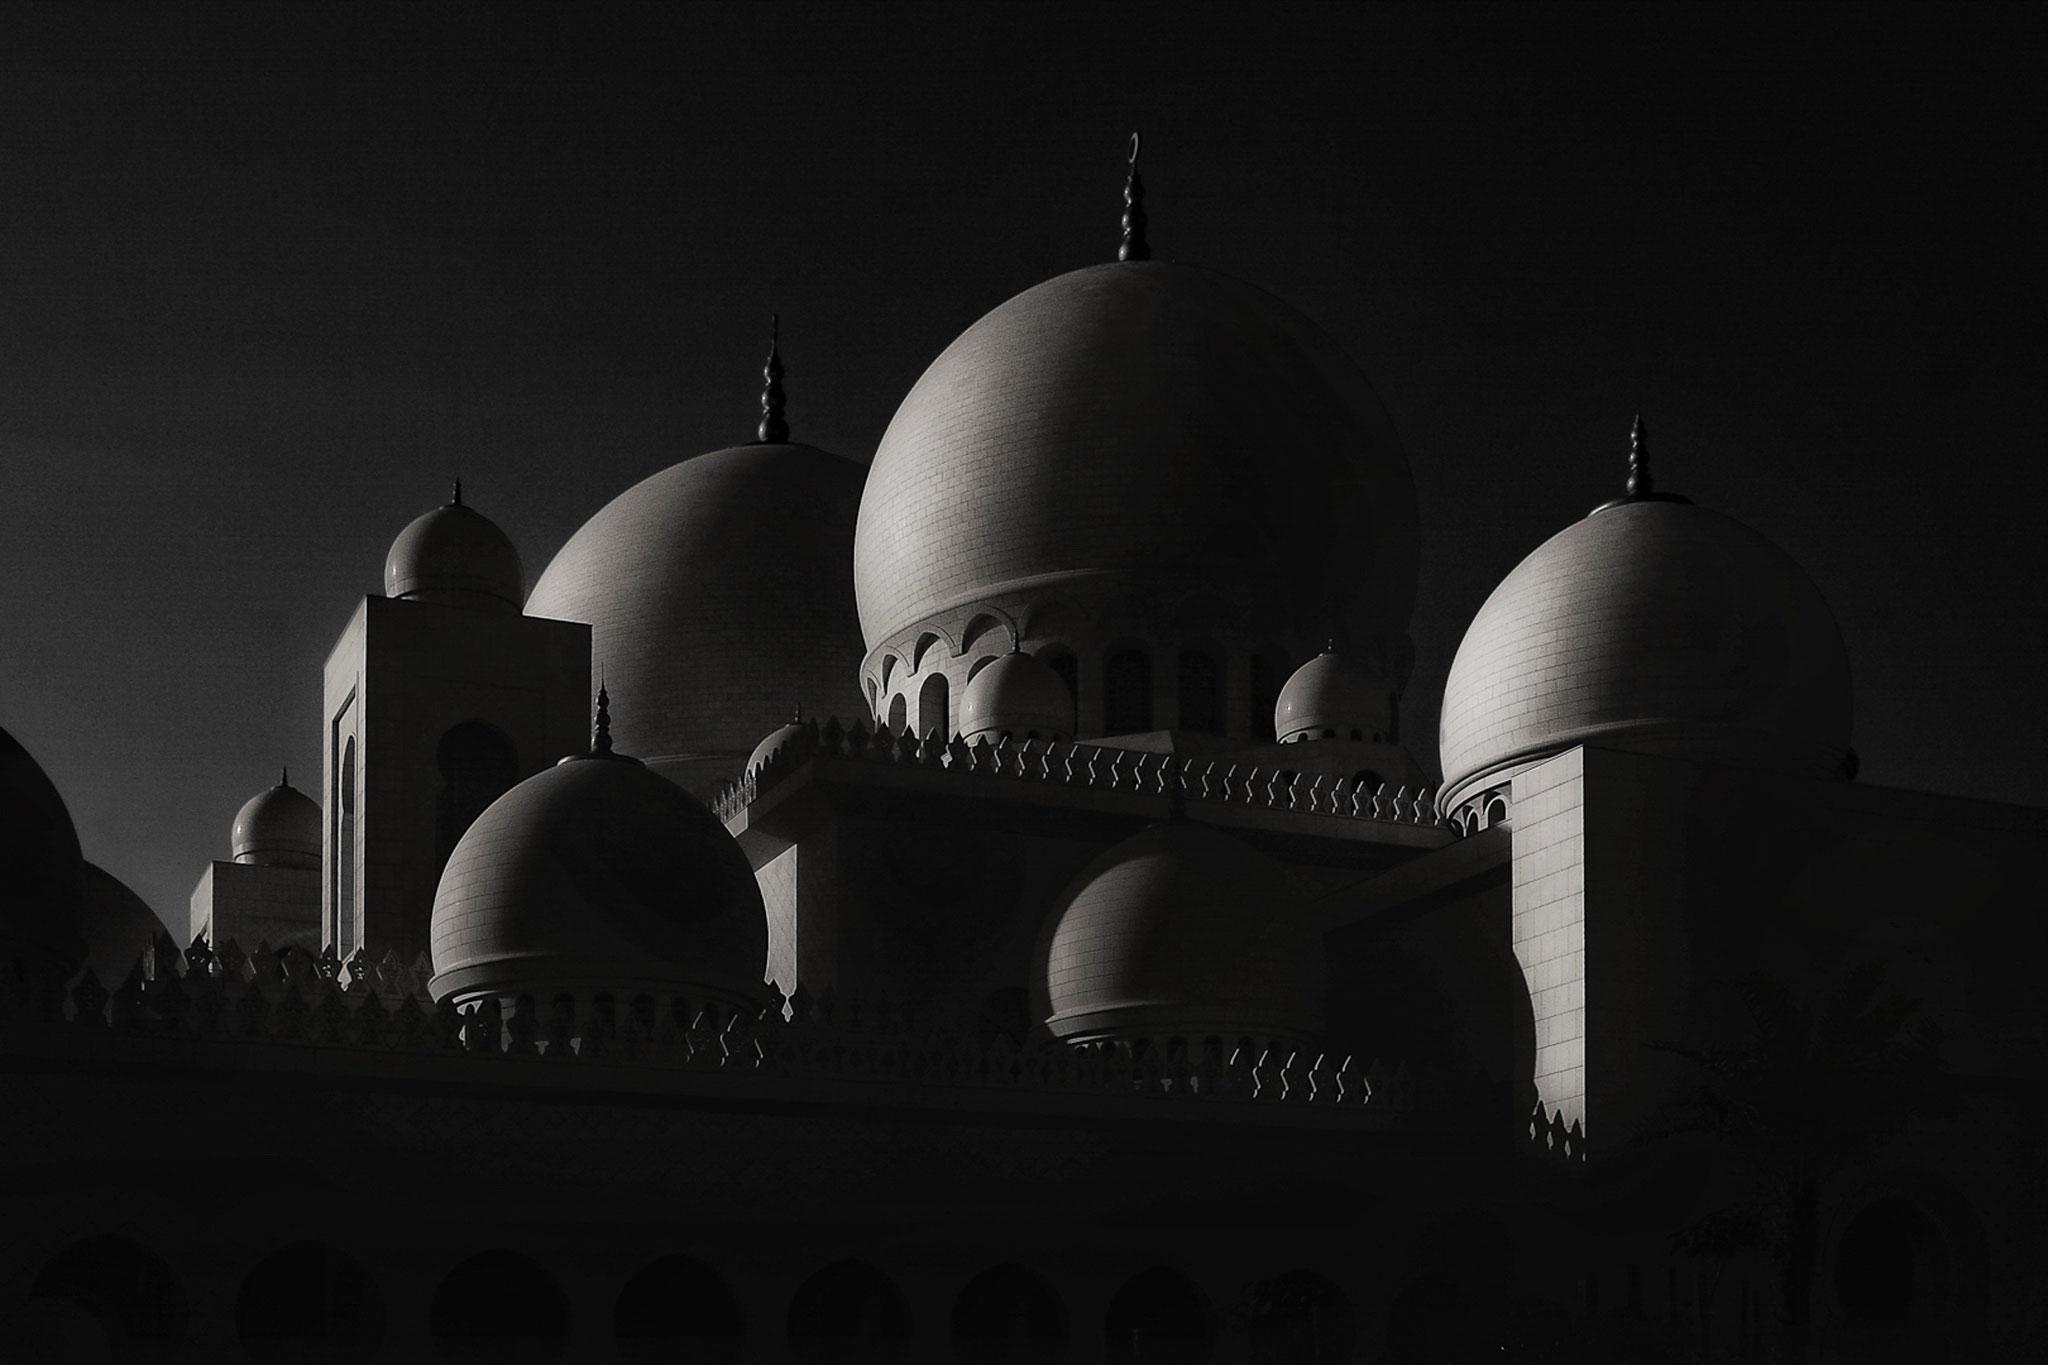 Firas Abussaud EFIAP  (Saudi Arabia) - Low Key